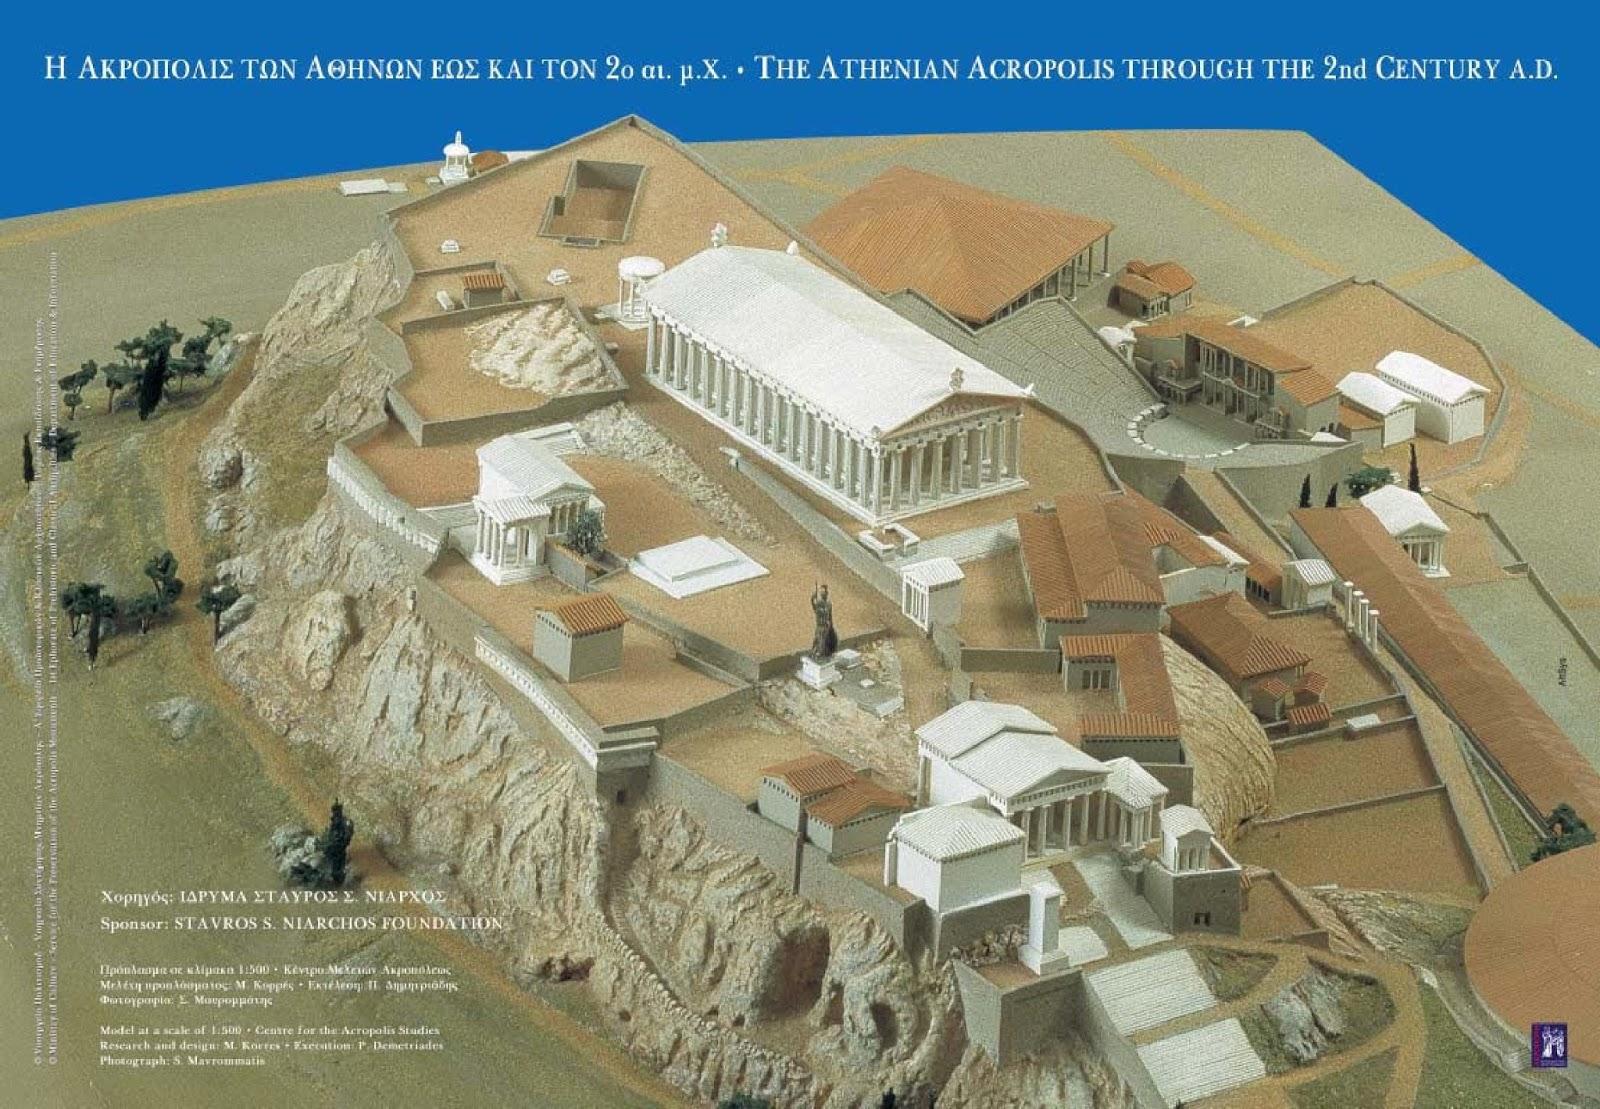 Through the 2nd Century CE